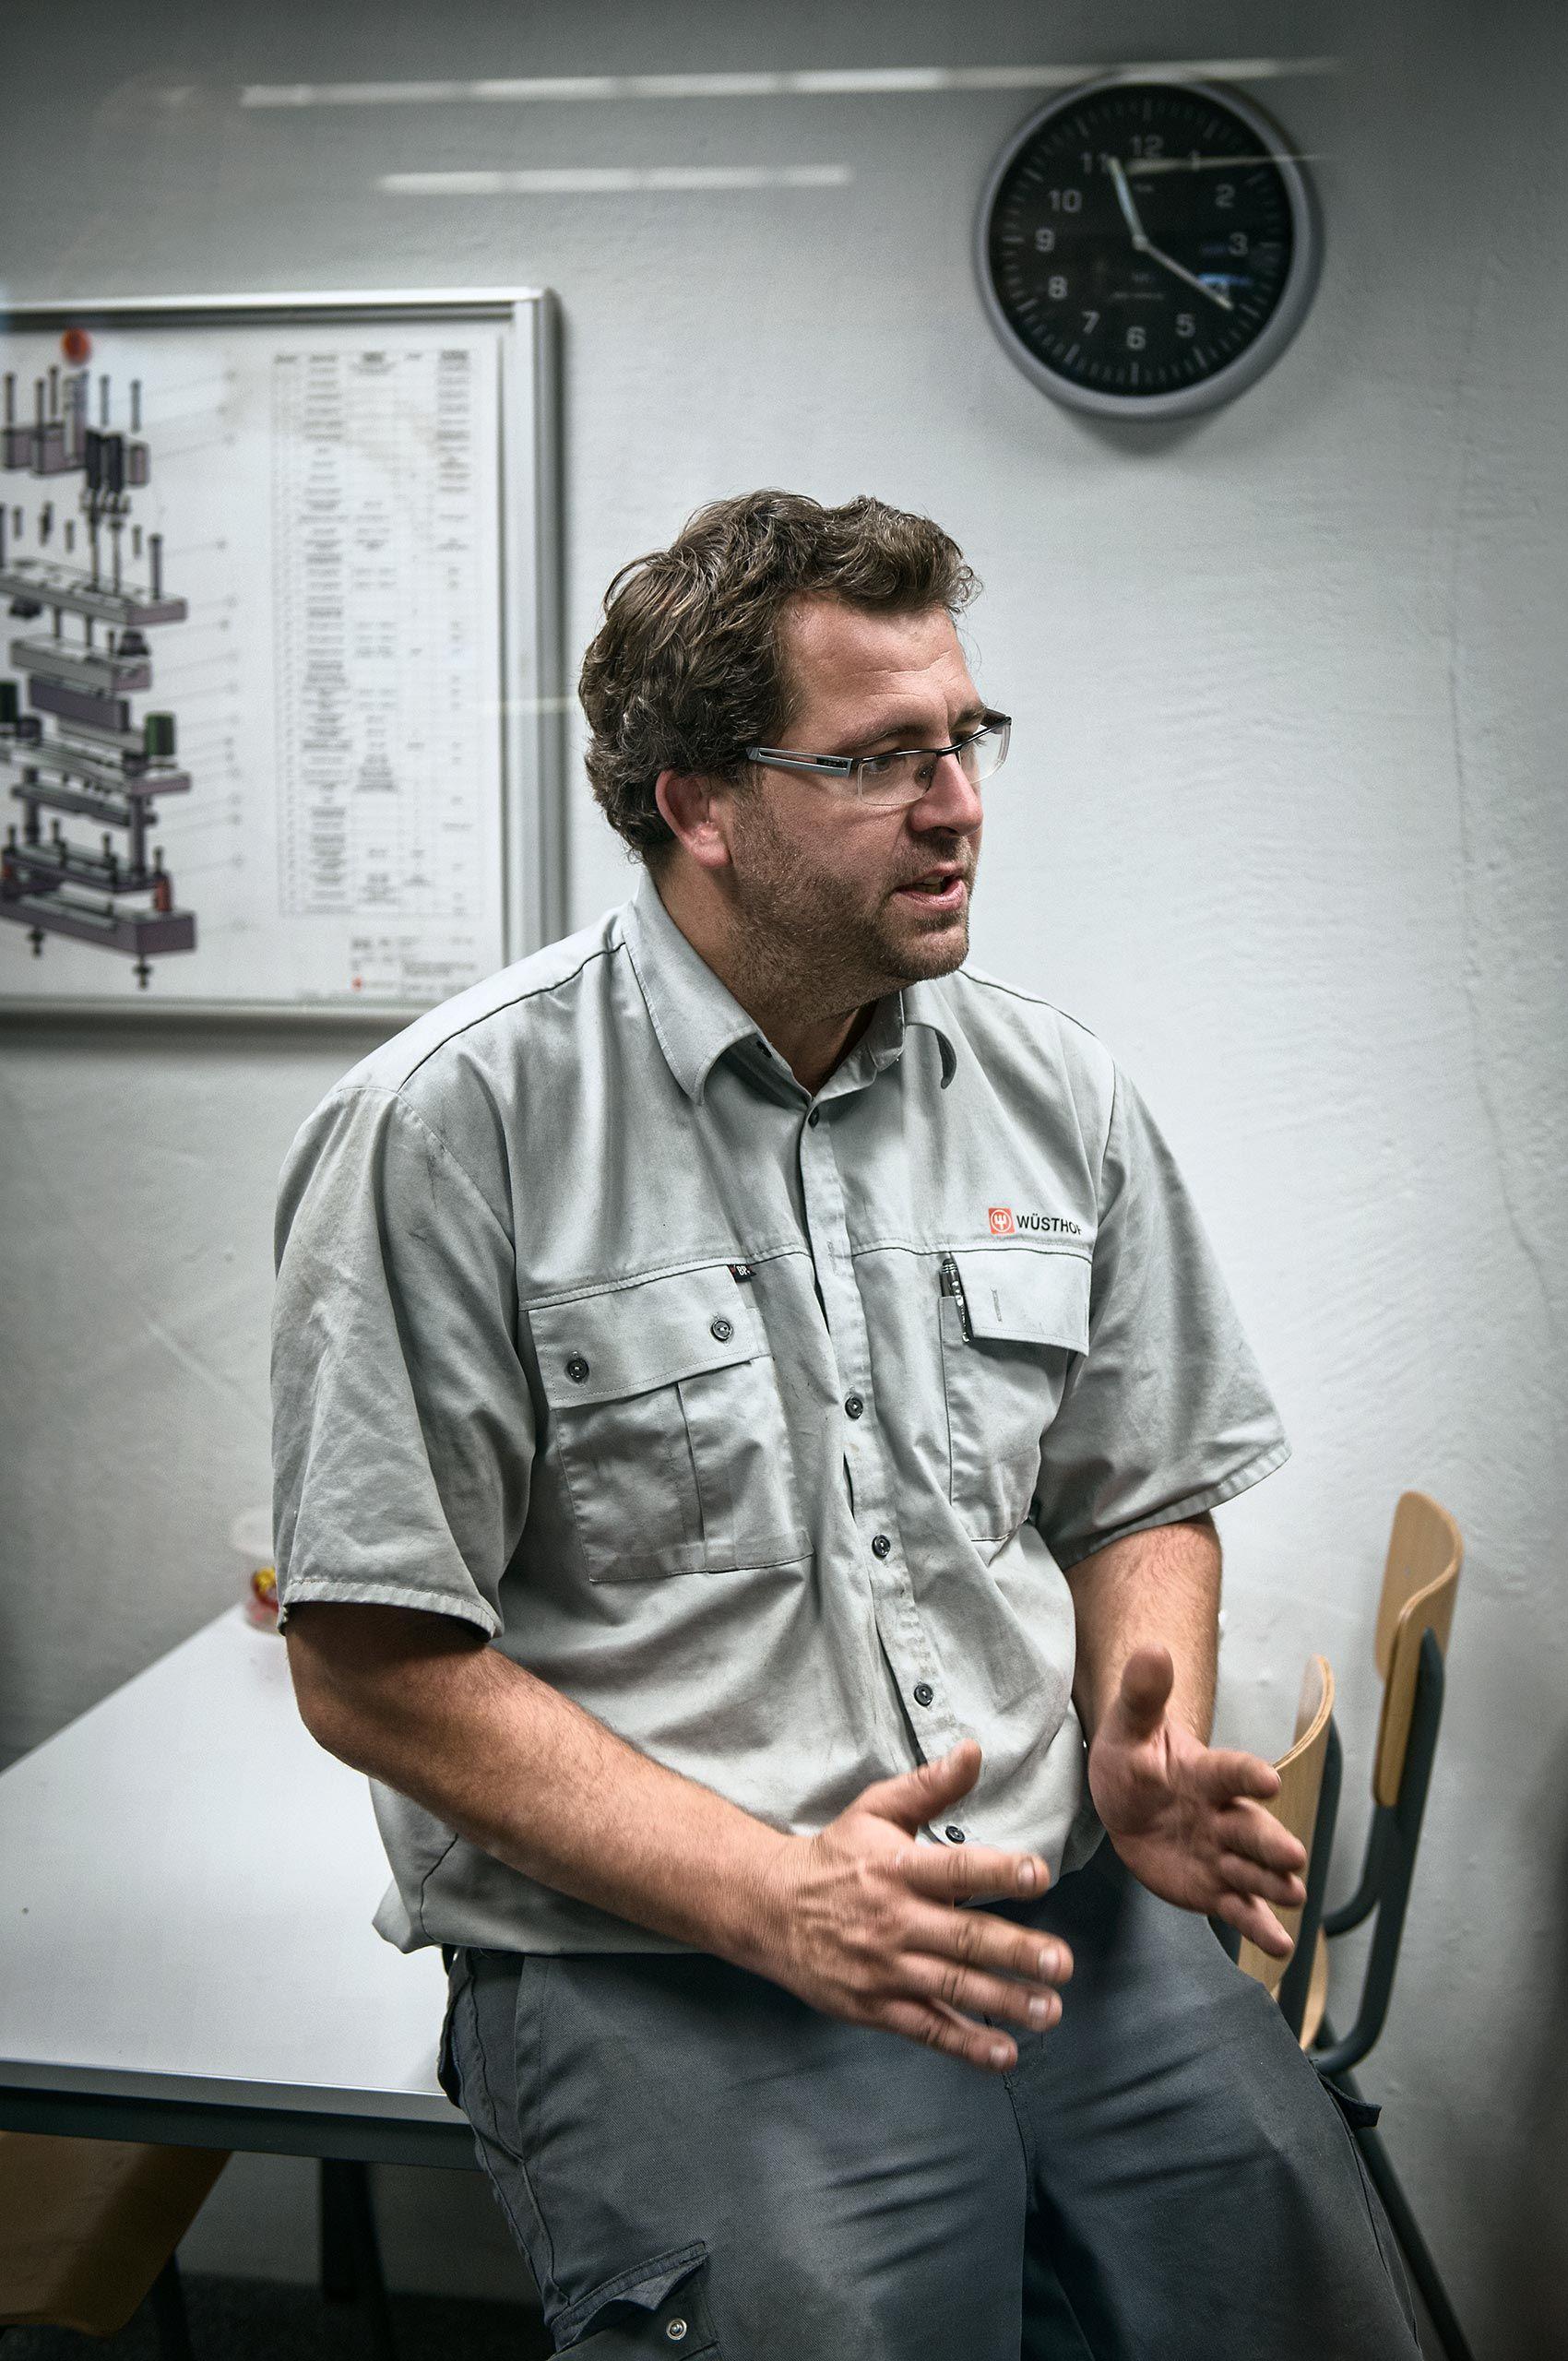 engeineer-explaining-wusthof-factory-HenrikOlundPhotography..jpg